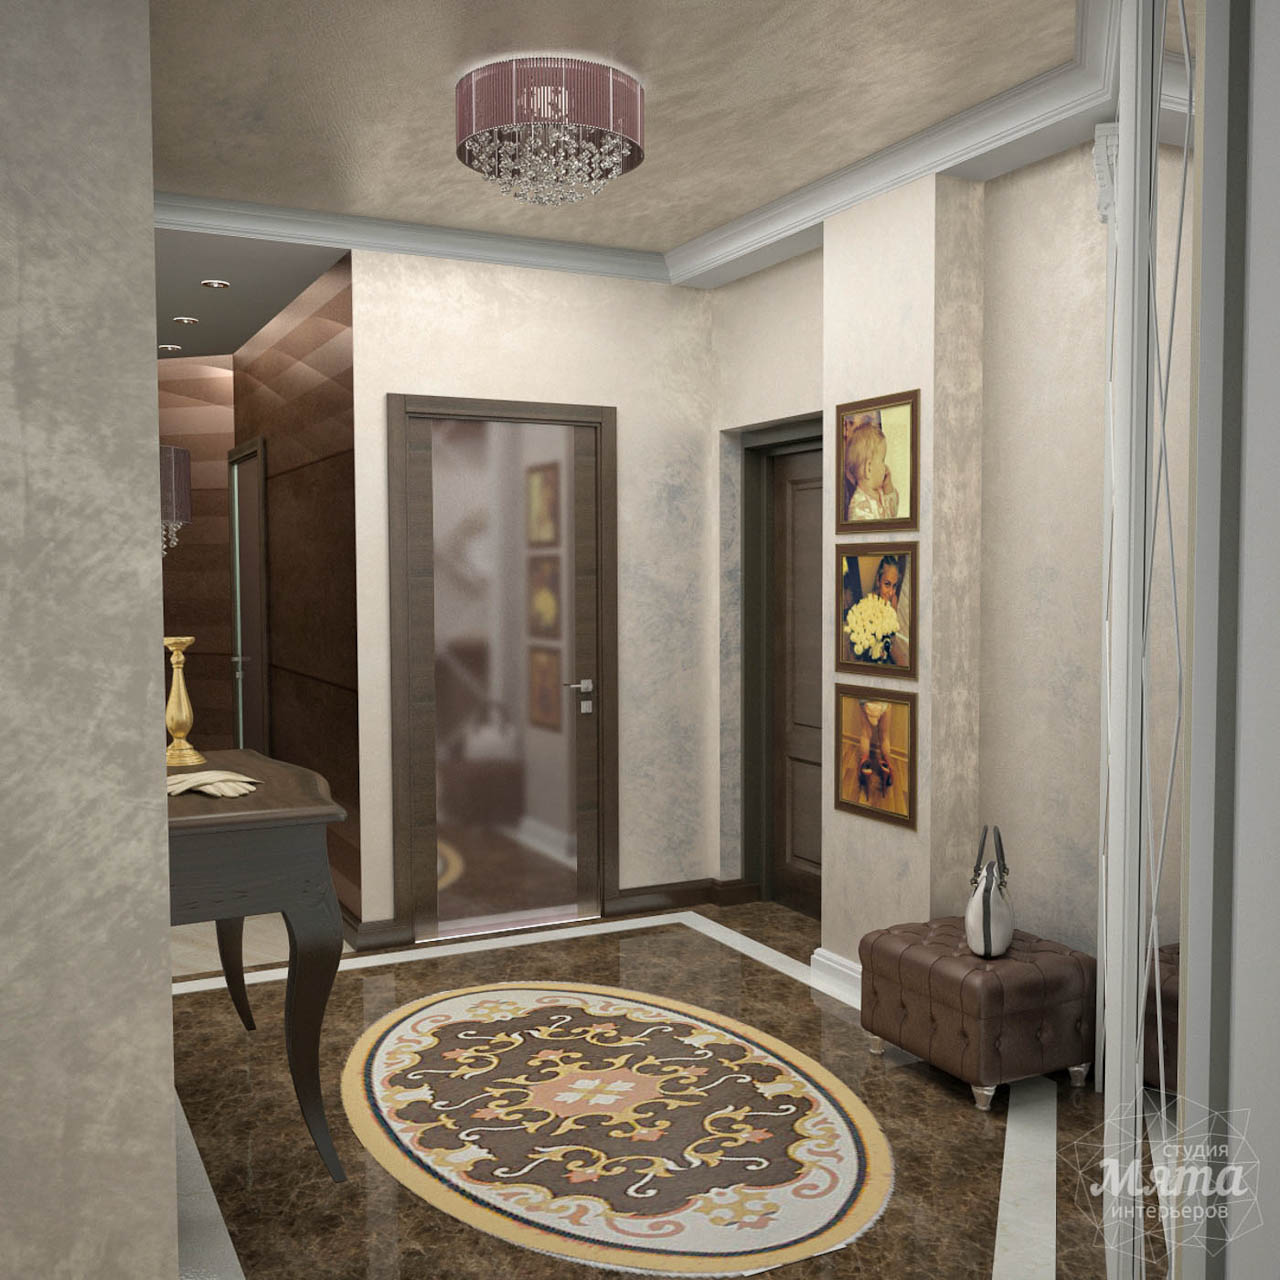 Дизайн интерьера и ремонт трехкомнатной квартиры по ул. 8 Марта 190 img46196577